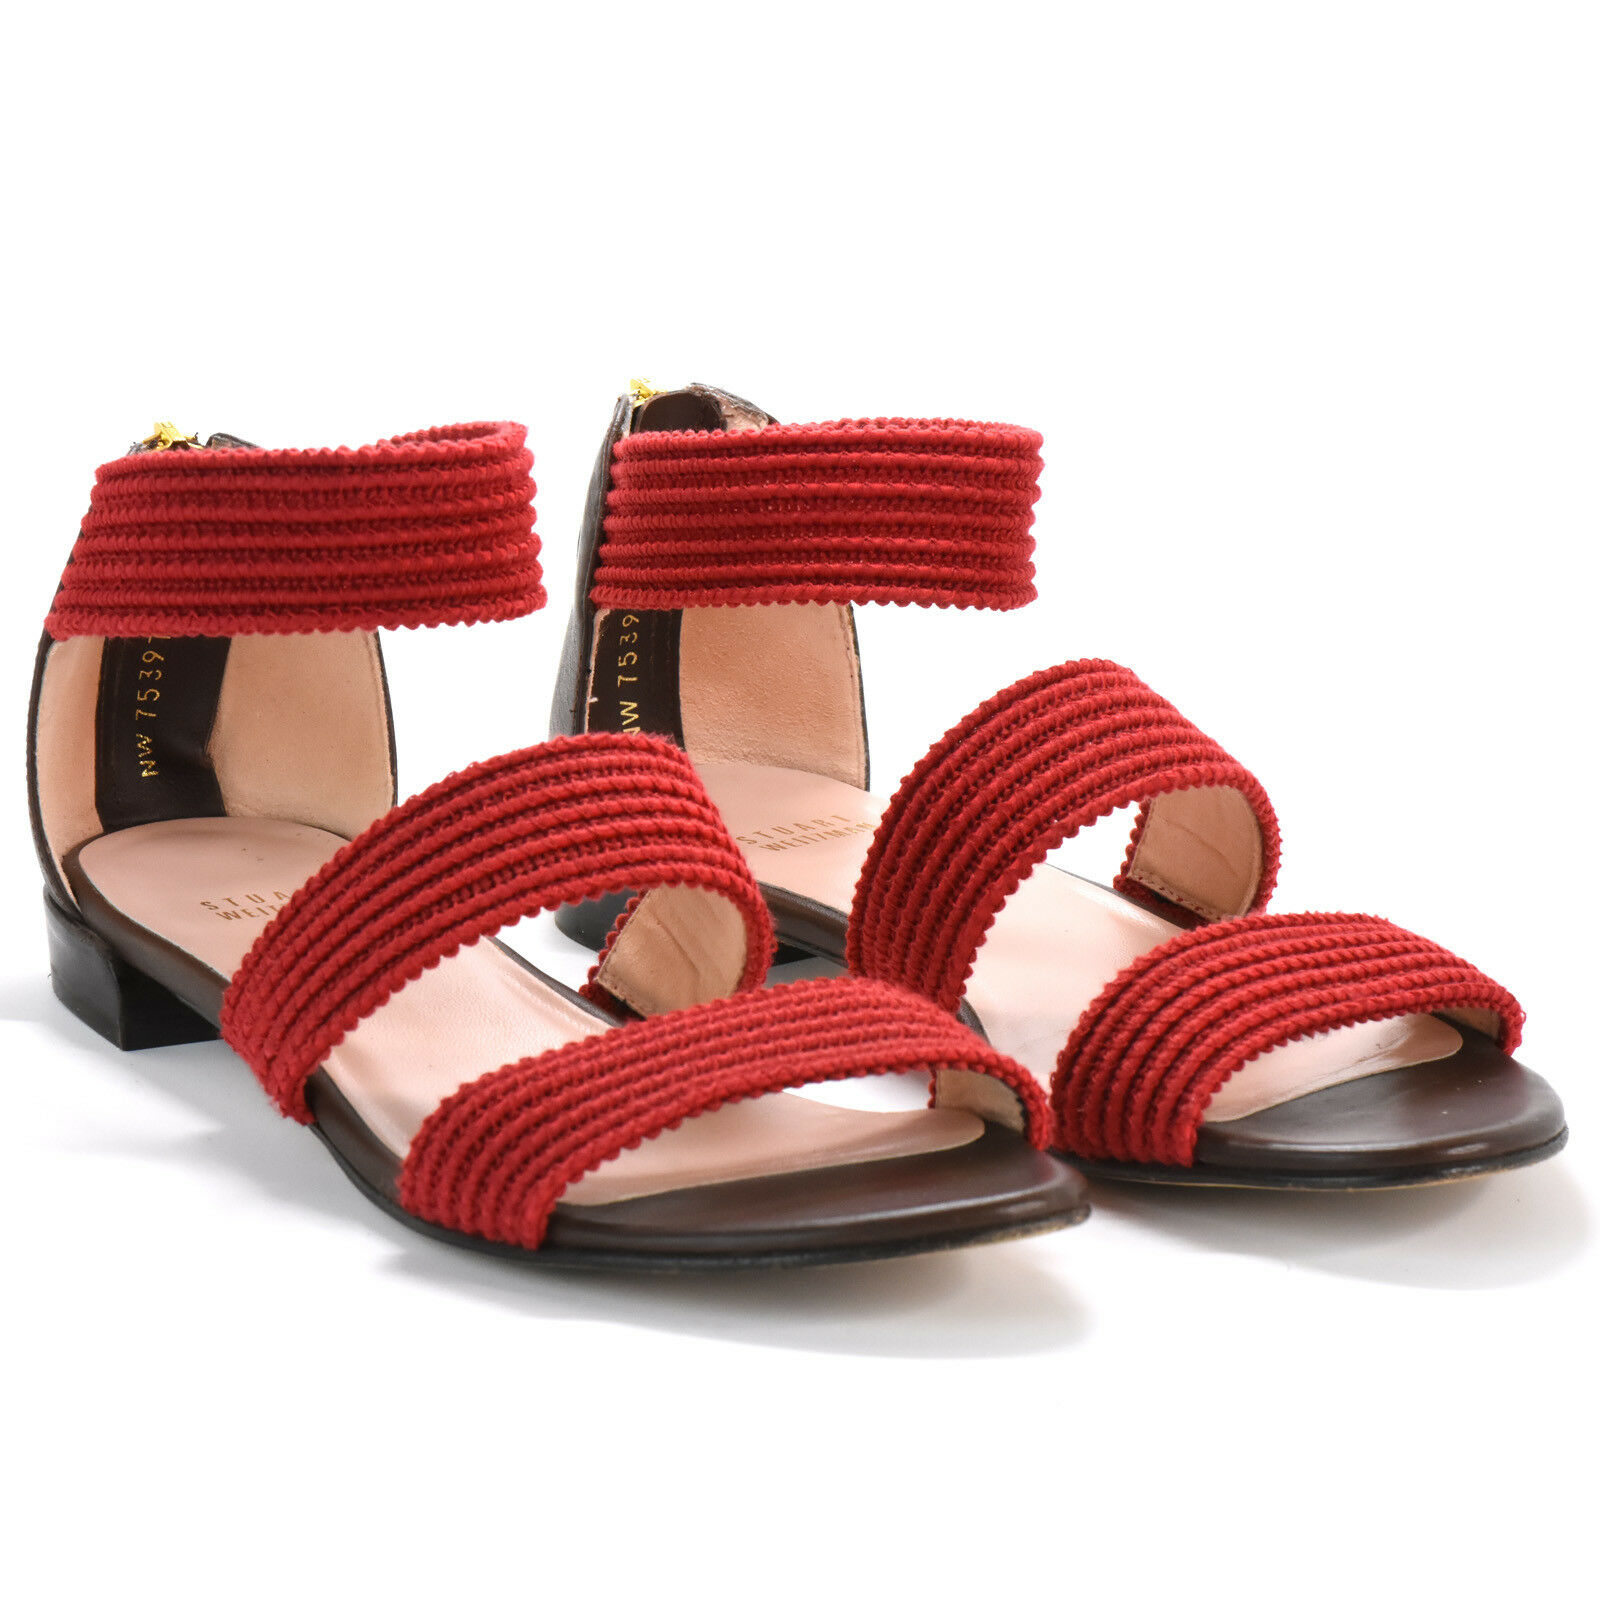 STUART WEITZMAN womens red sandals with zipper back 7 7 7 M 826476